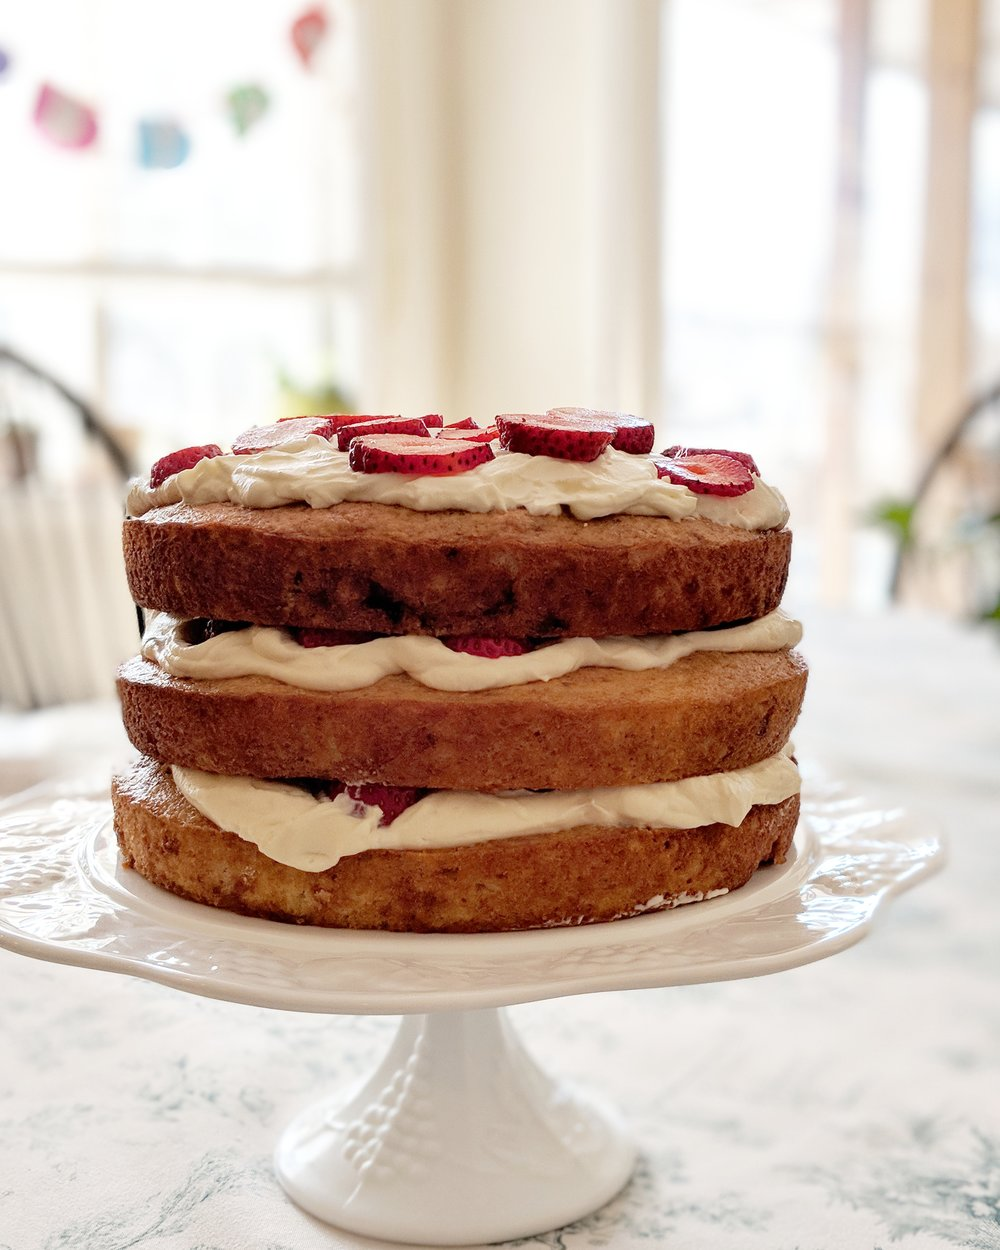 Makes allllllll the birthday cakes